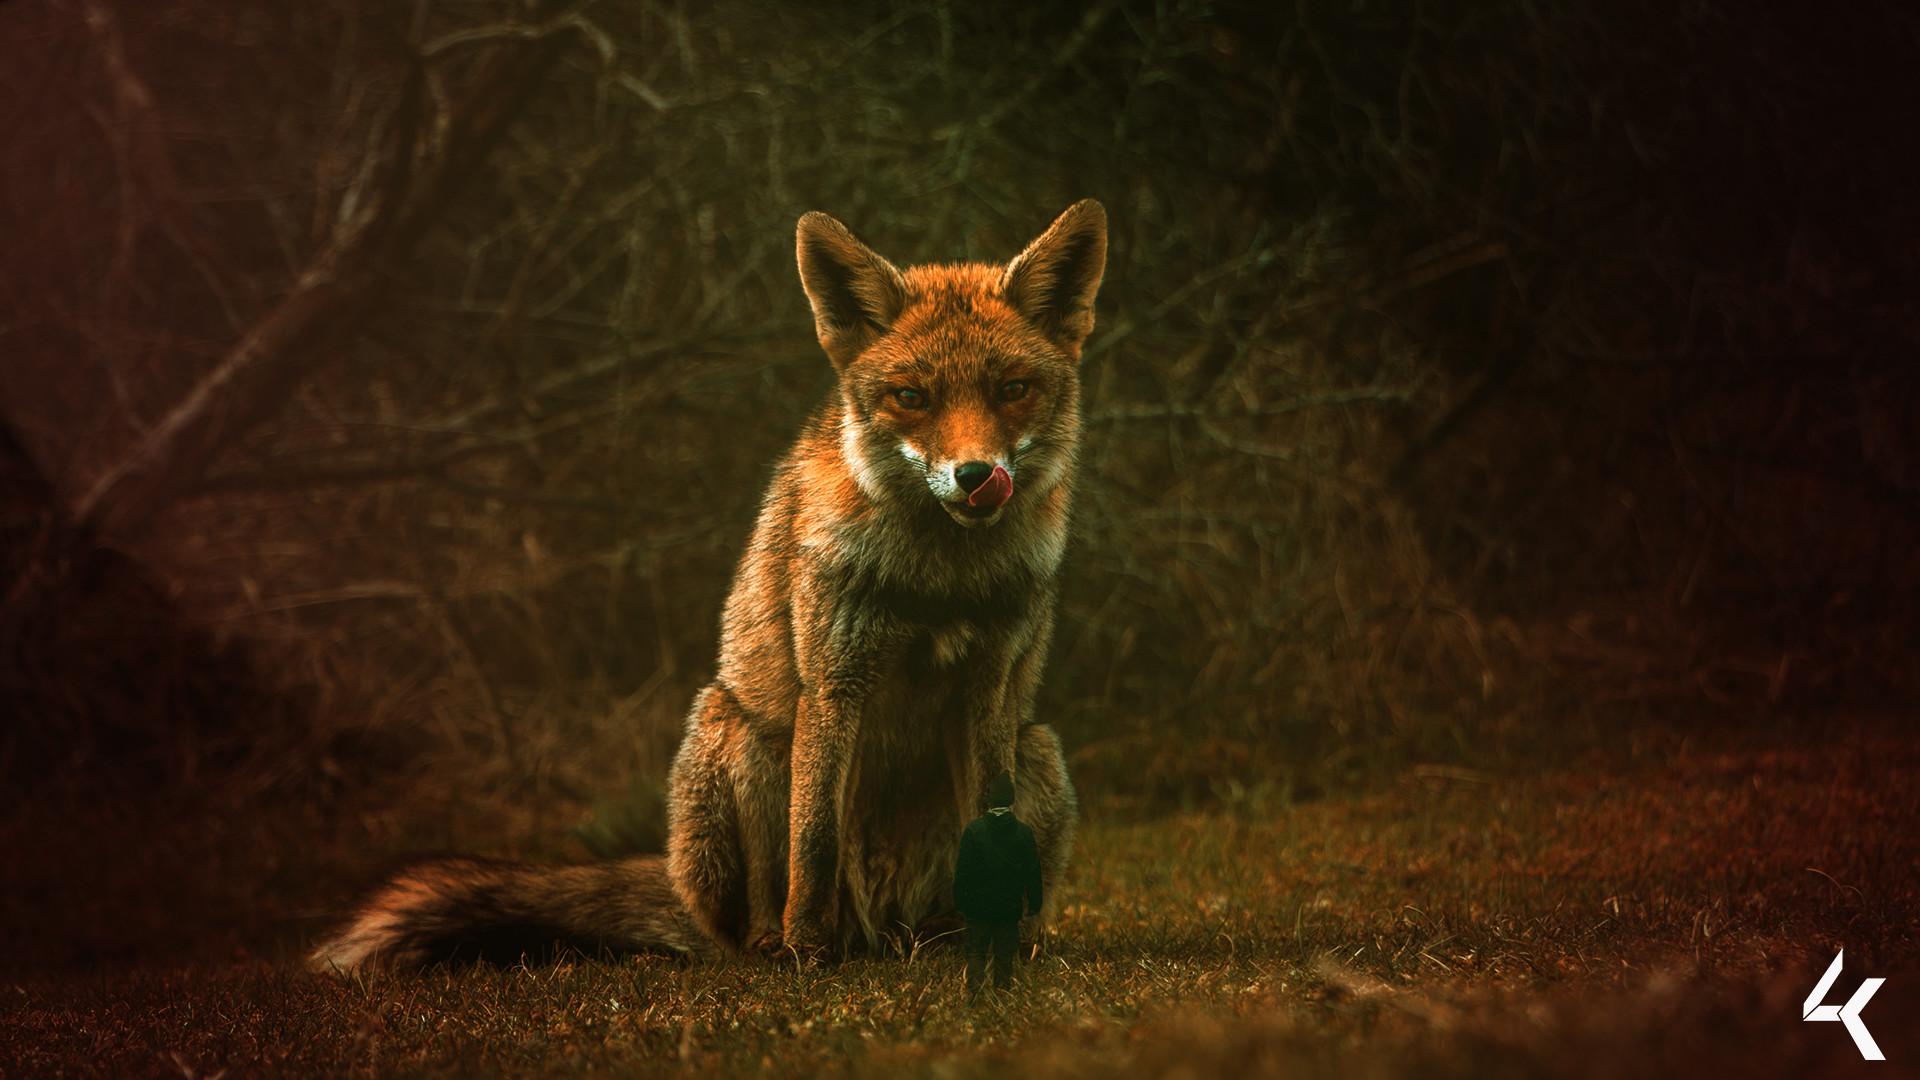 Lukas groh great fox